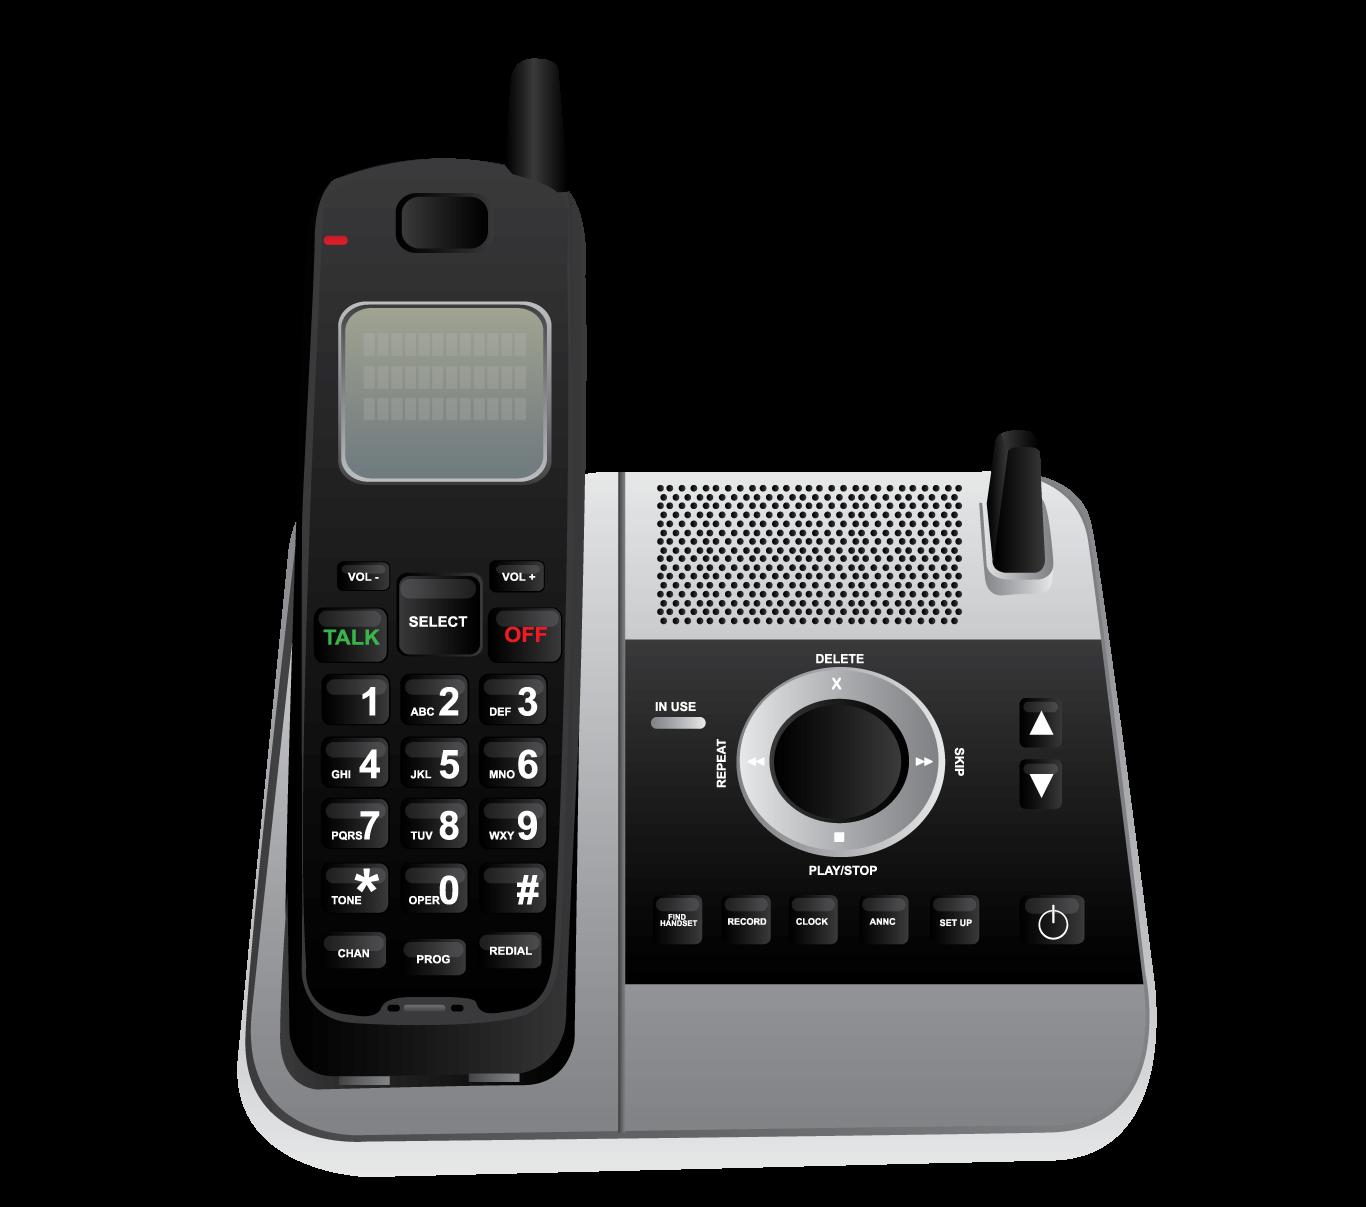 The telephone: Evolving communication